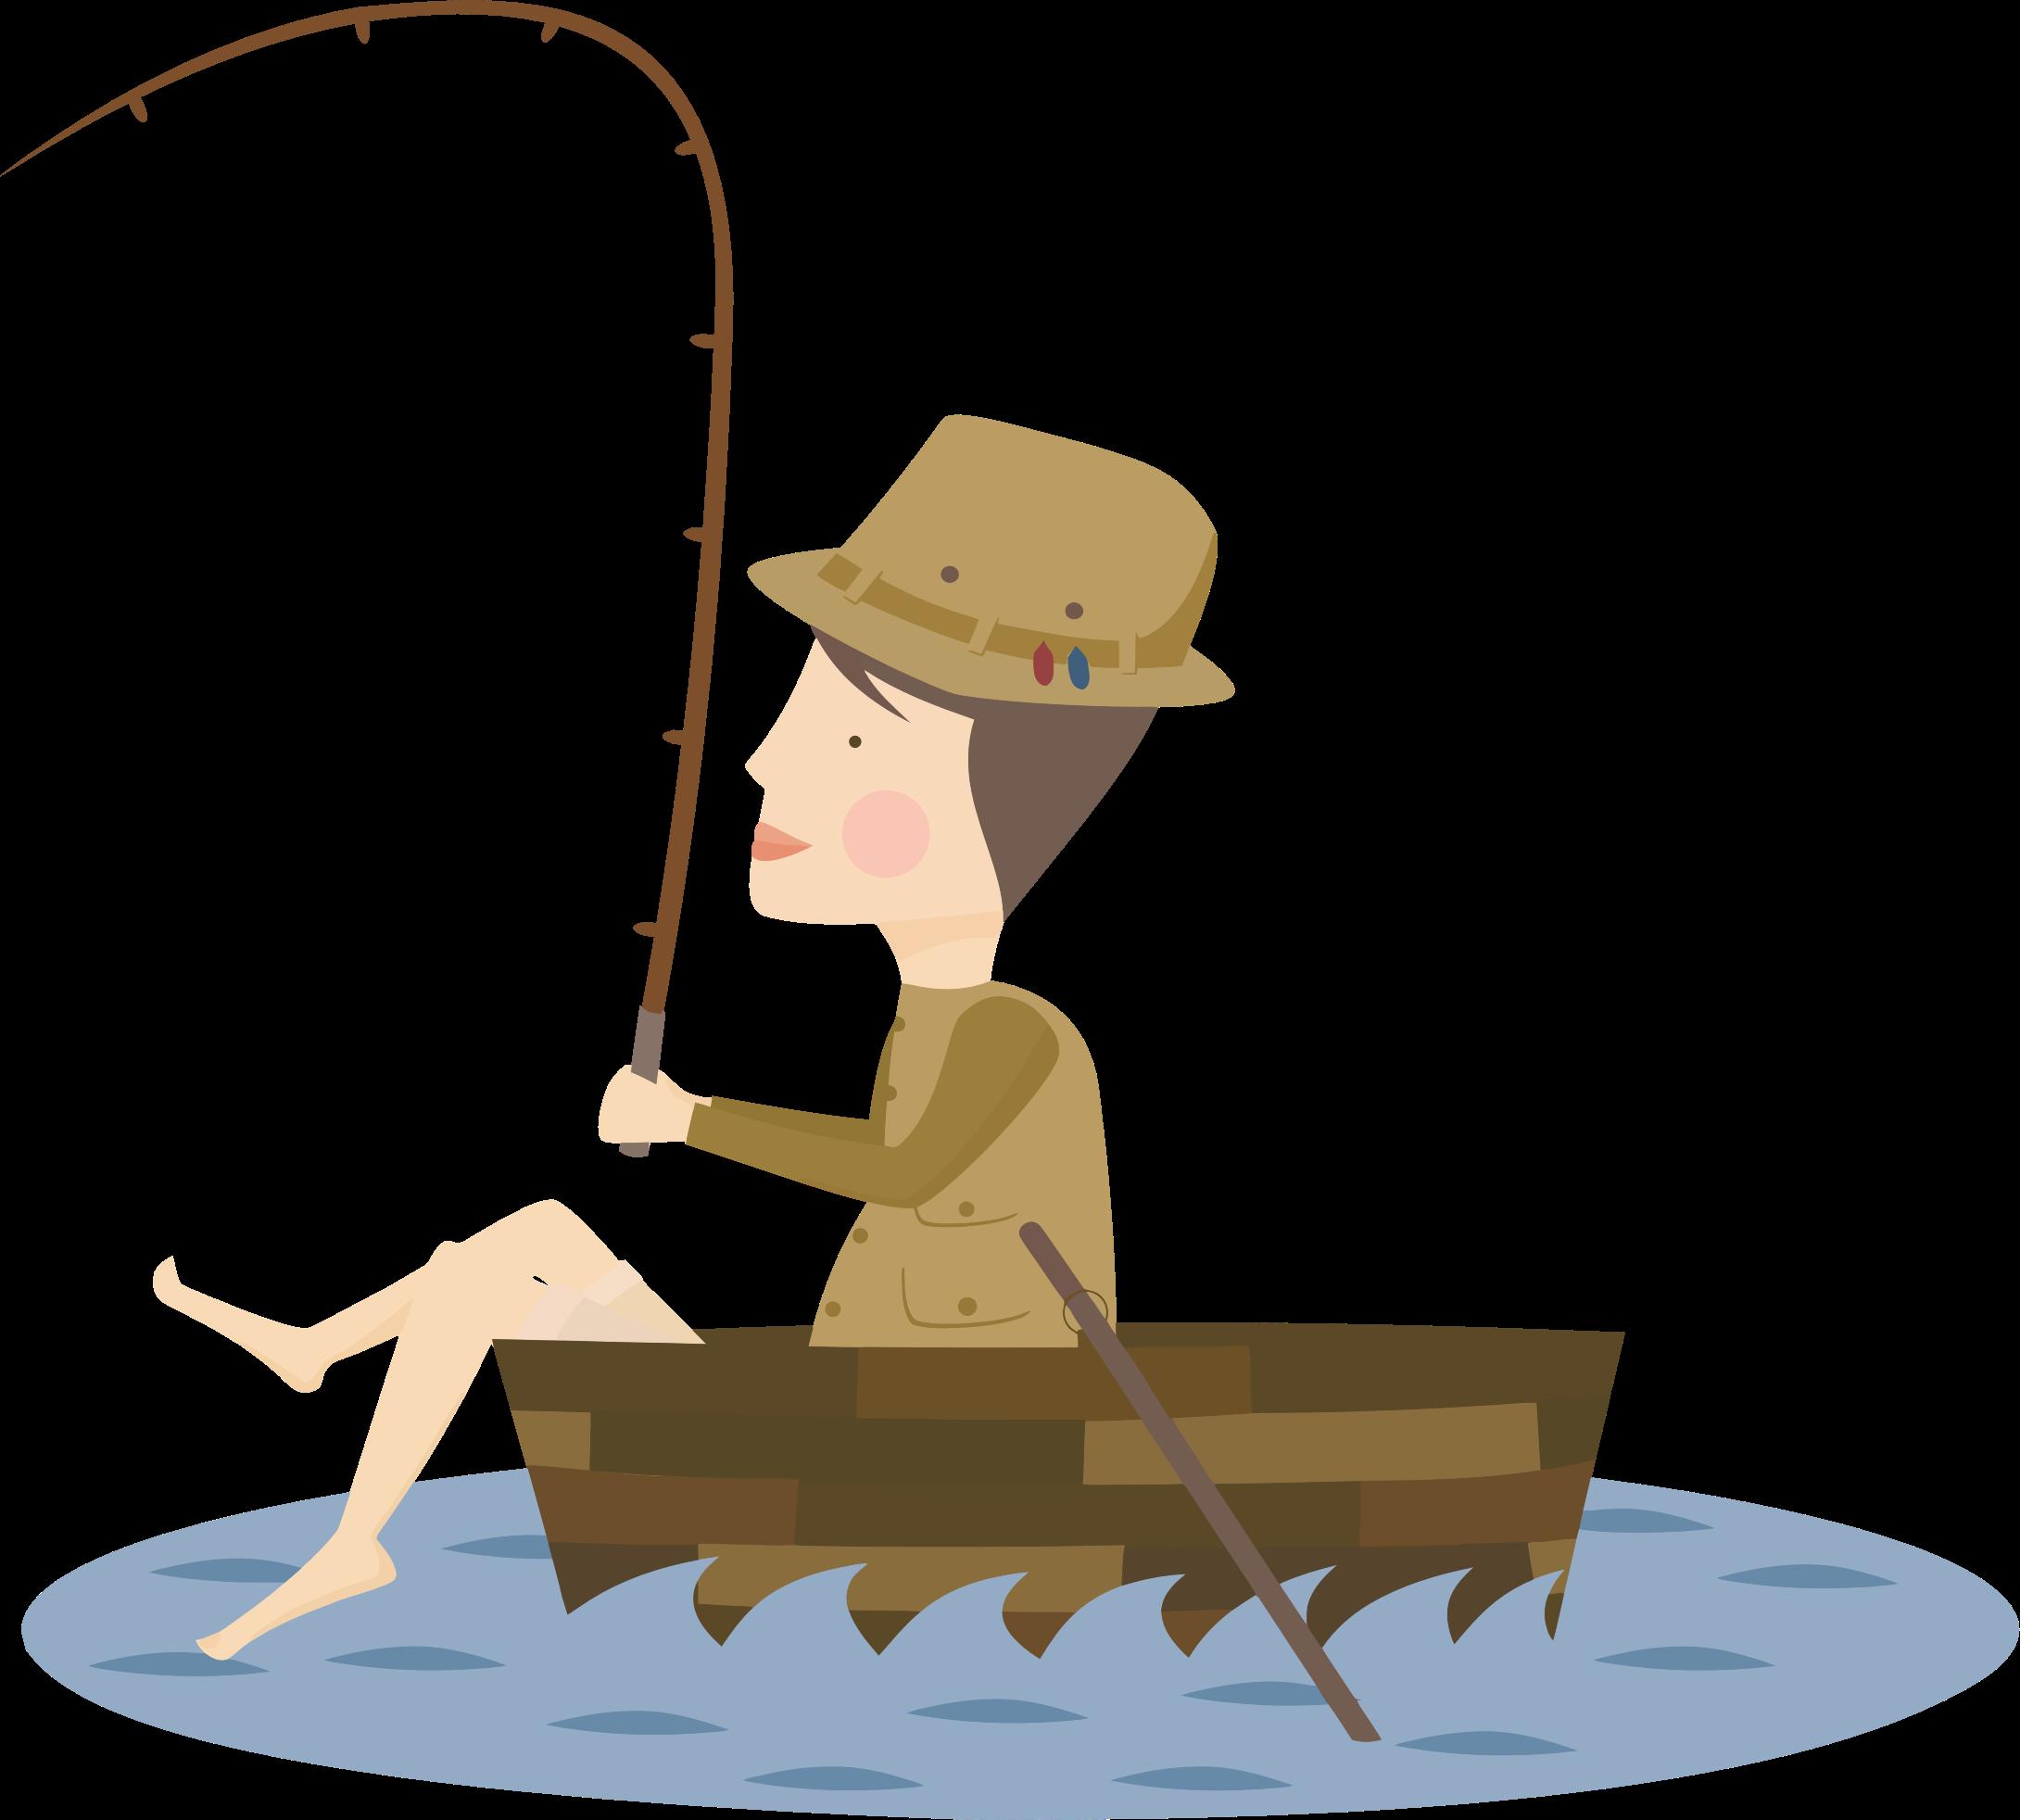 Fishing clipart fisher. Cartoon fisherman big image